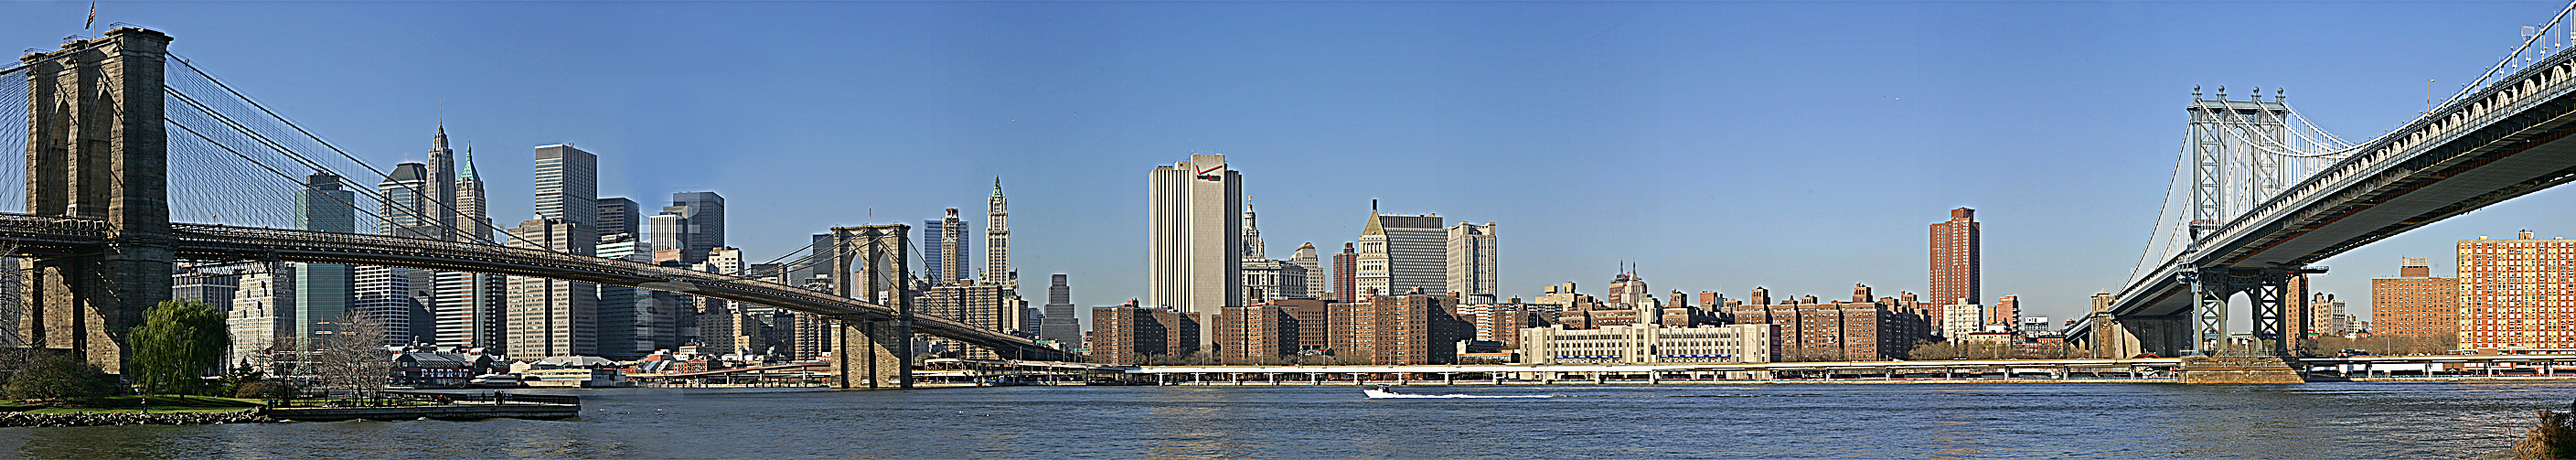 Brooklyn-Manhattan-Bridge-Pano3